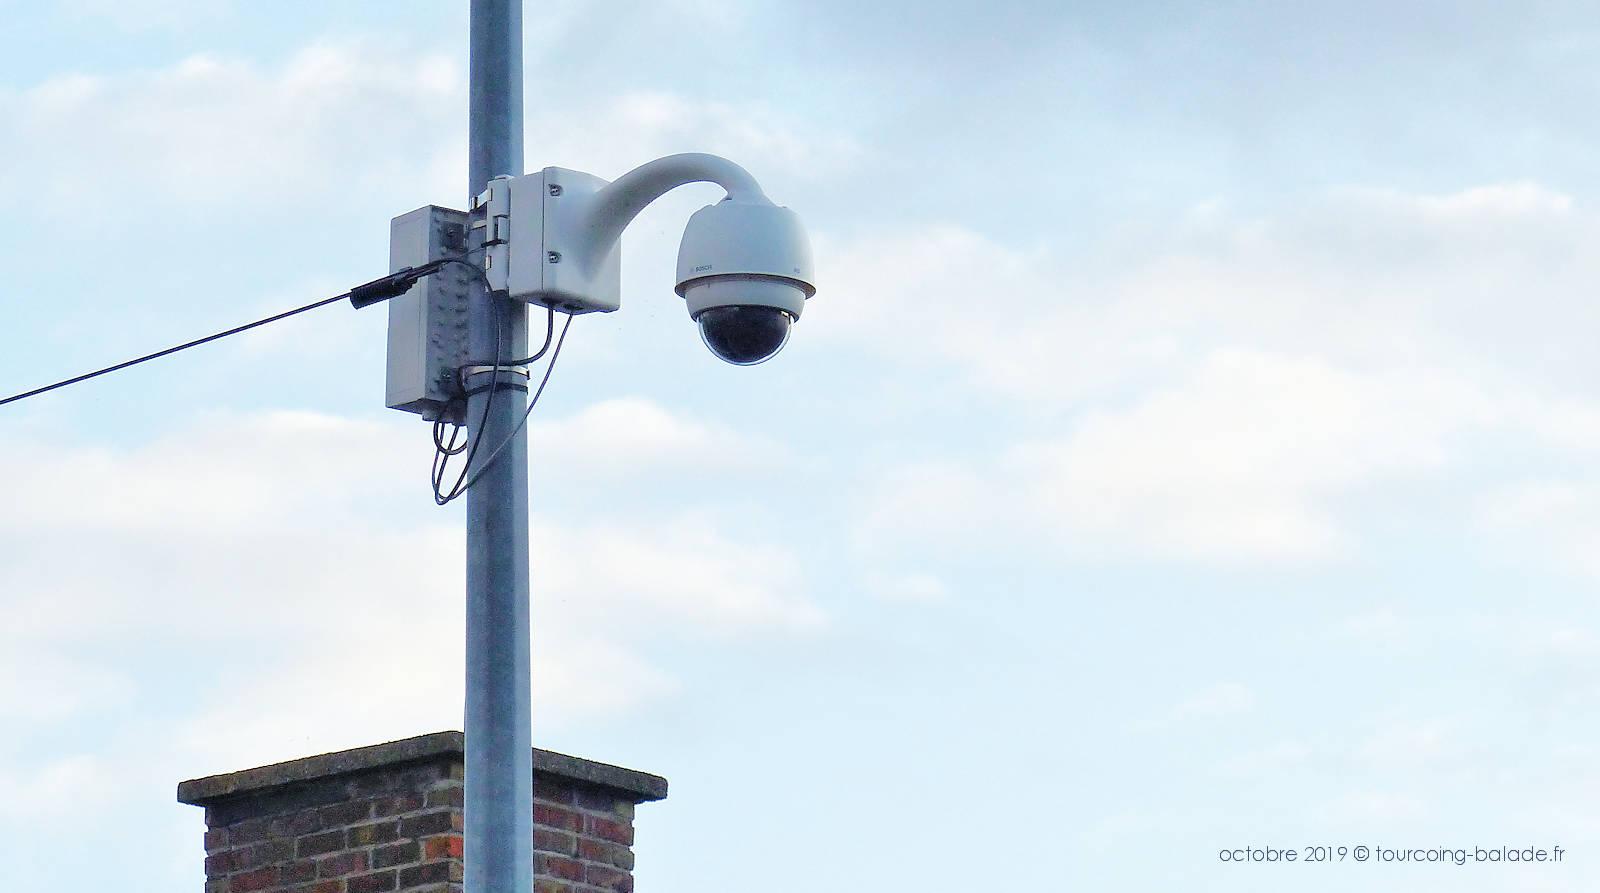 Caméras vidéosurveillance Tourcoing - Collège Saint Gabriel